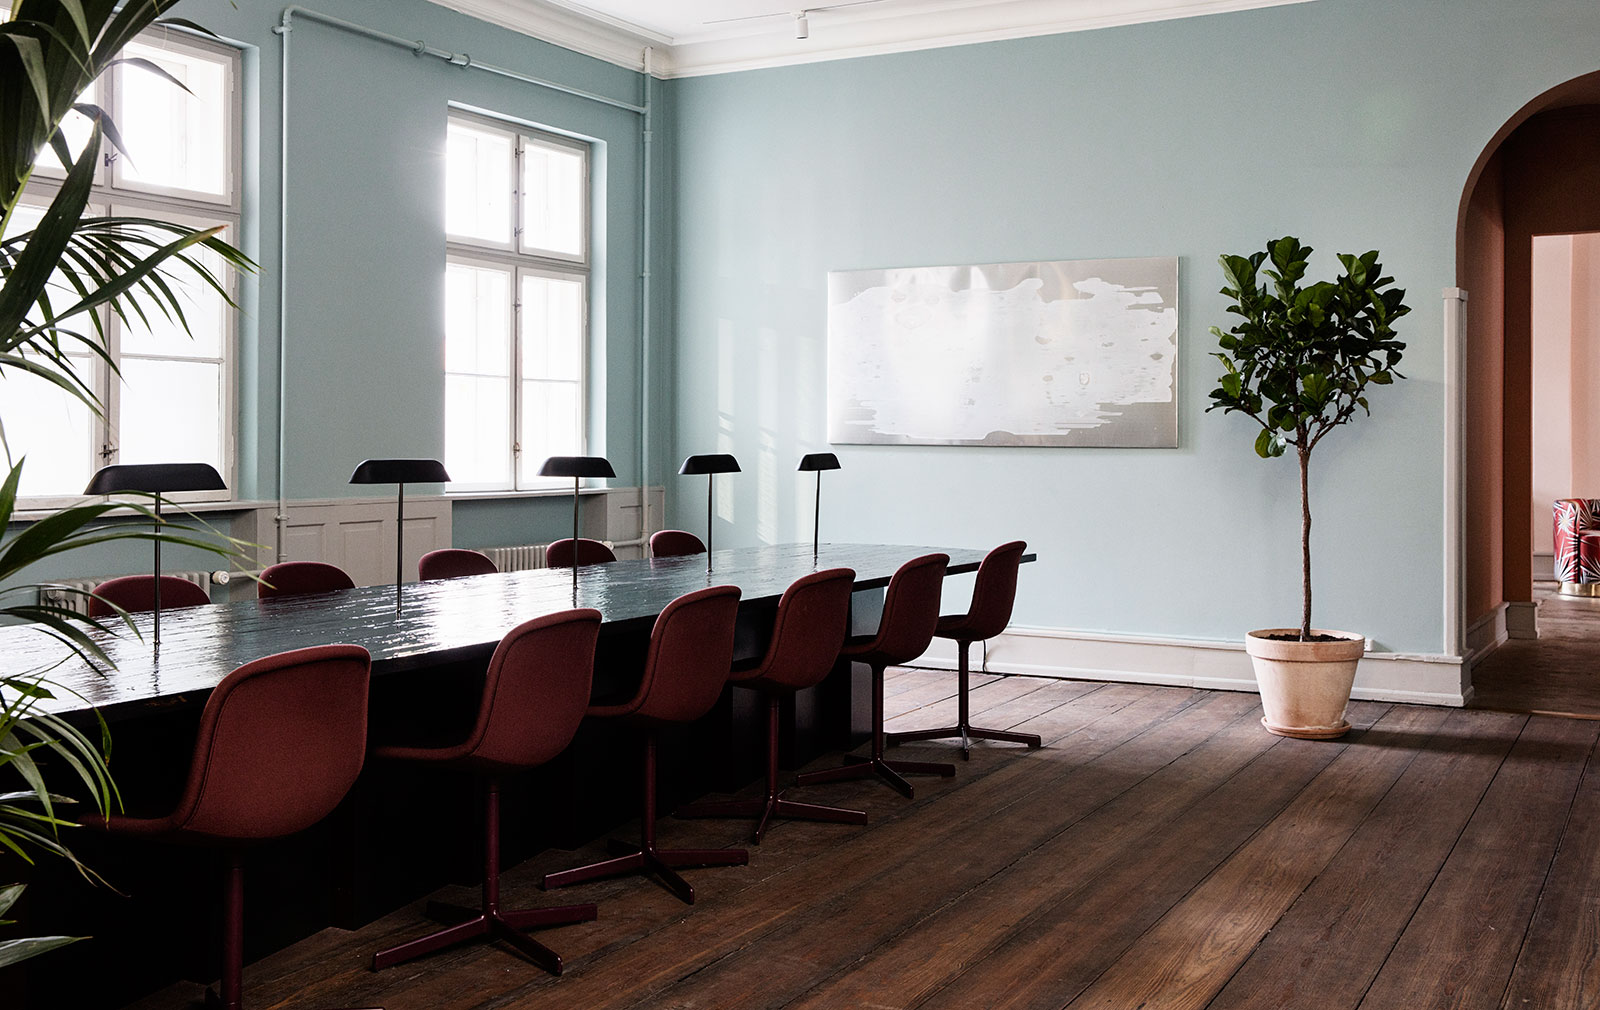 Nomad workspace – a coworking space in Copenhagen